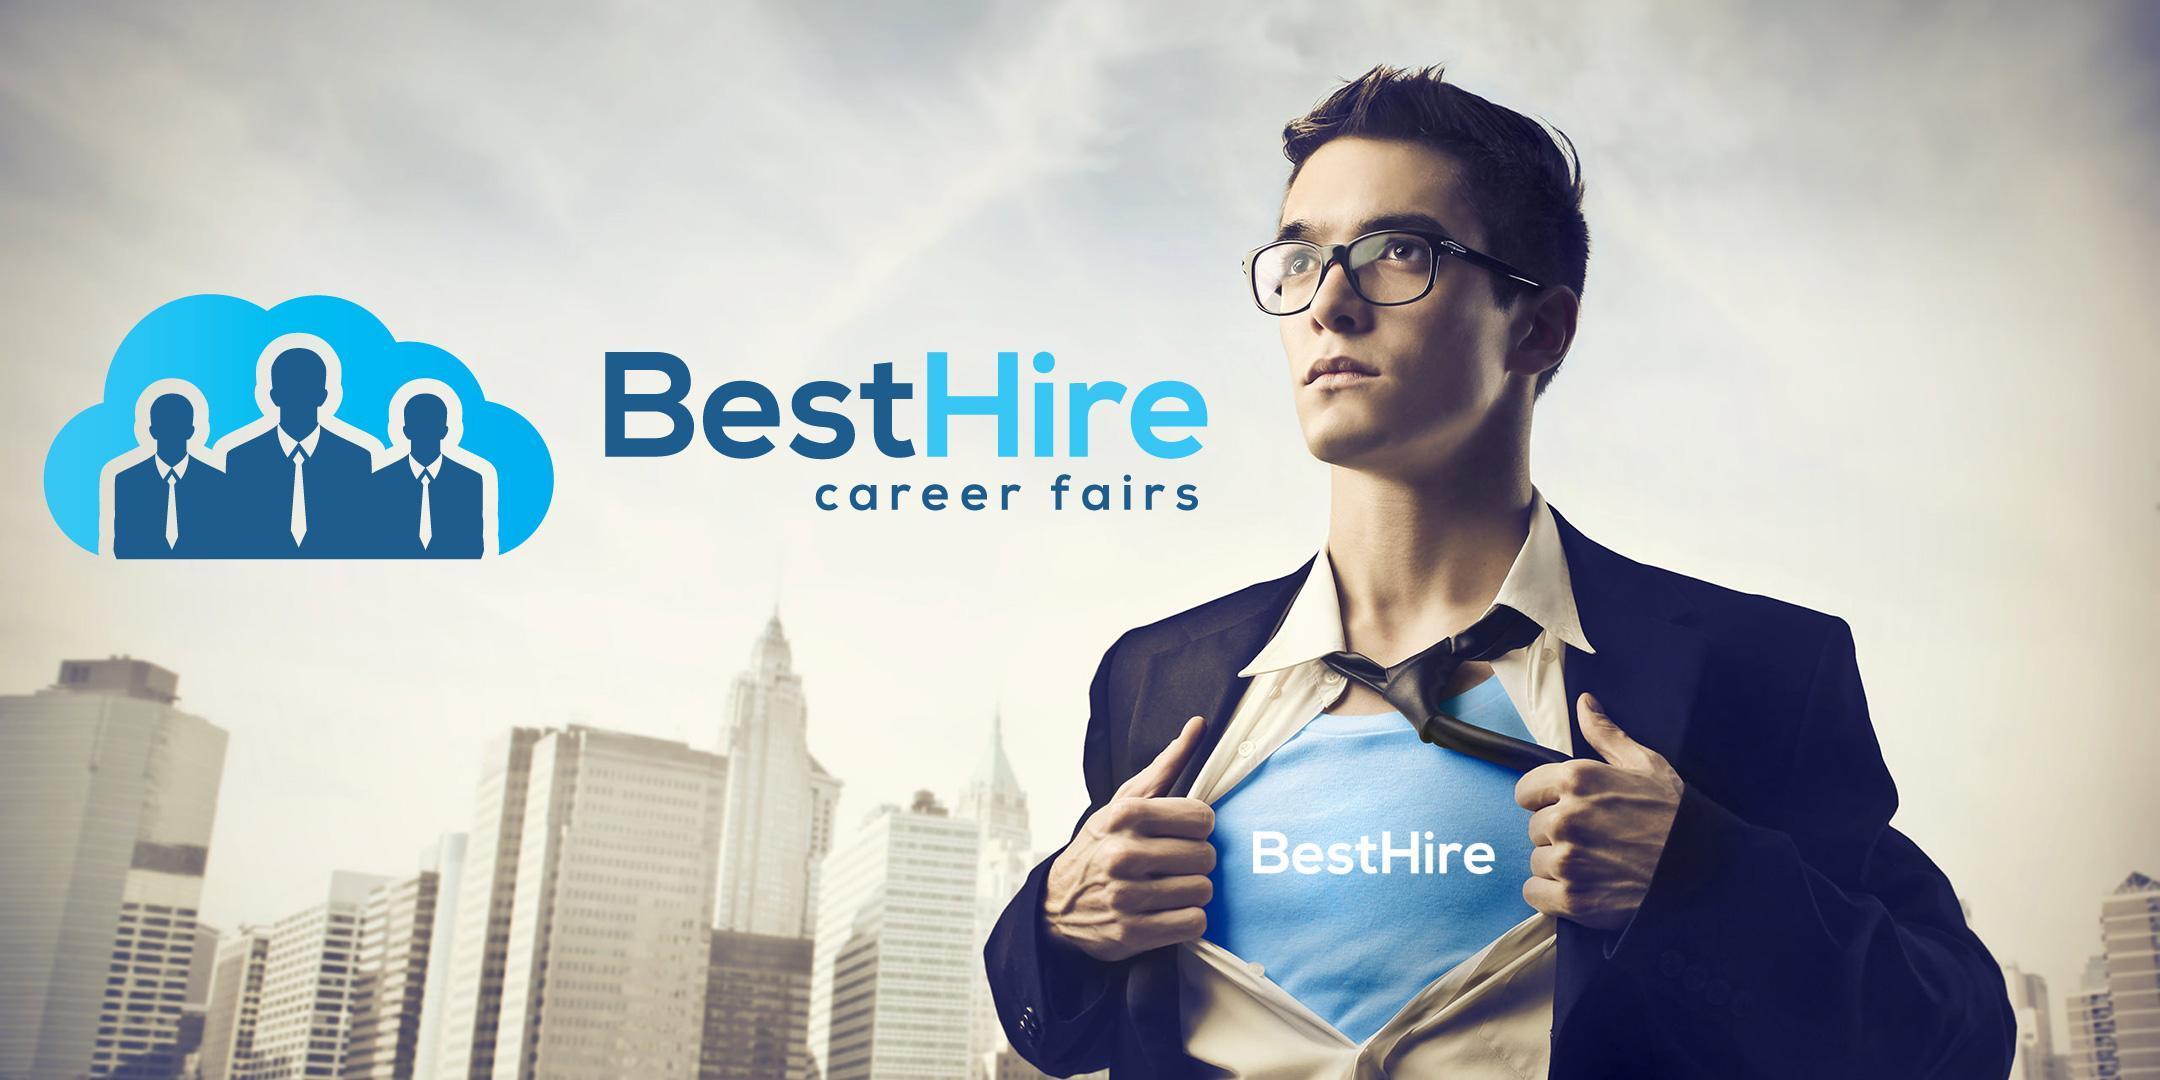 Dallas Career Fair - October 12, 2017 Job Fairs & Hiring Events in Dallas TX